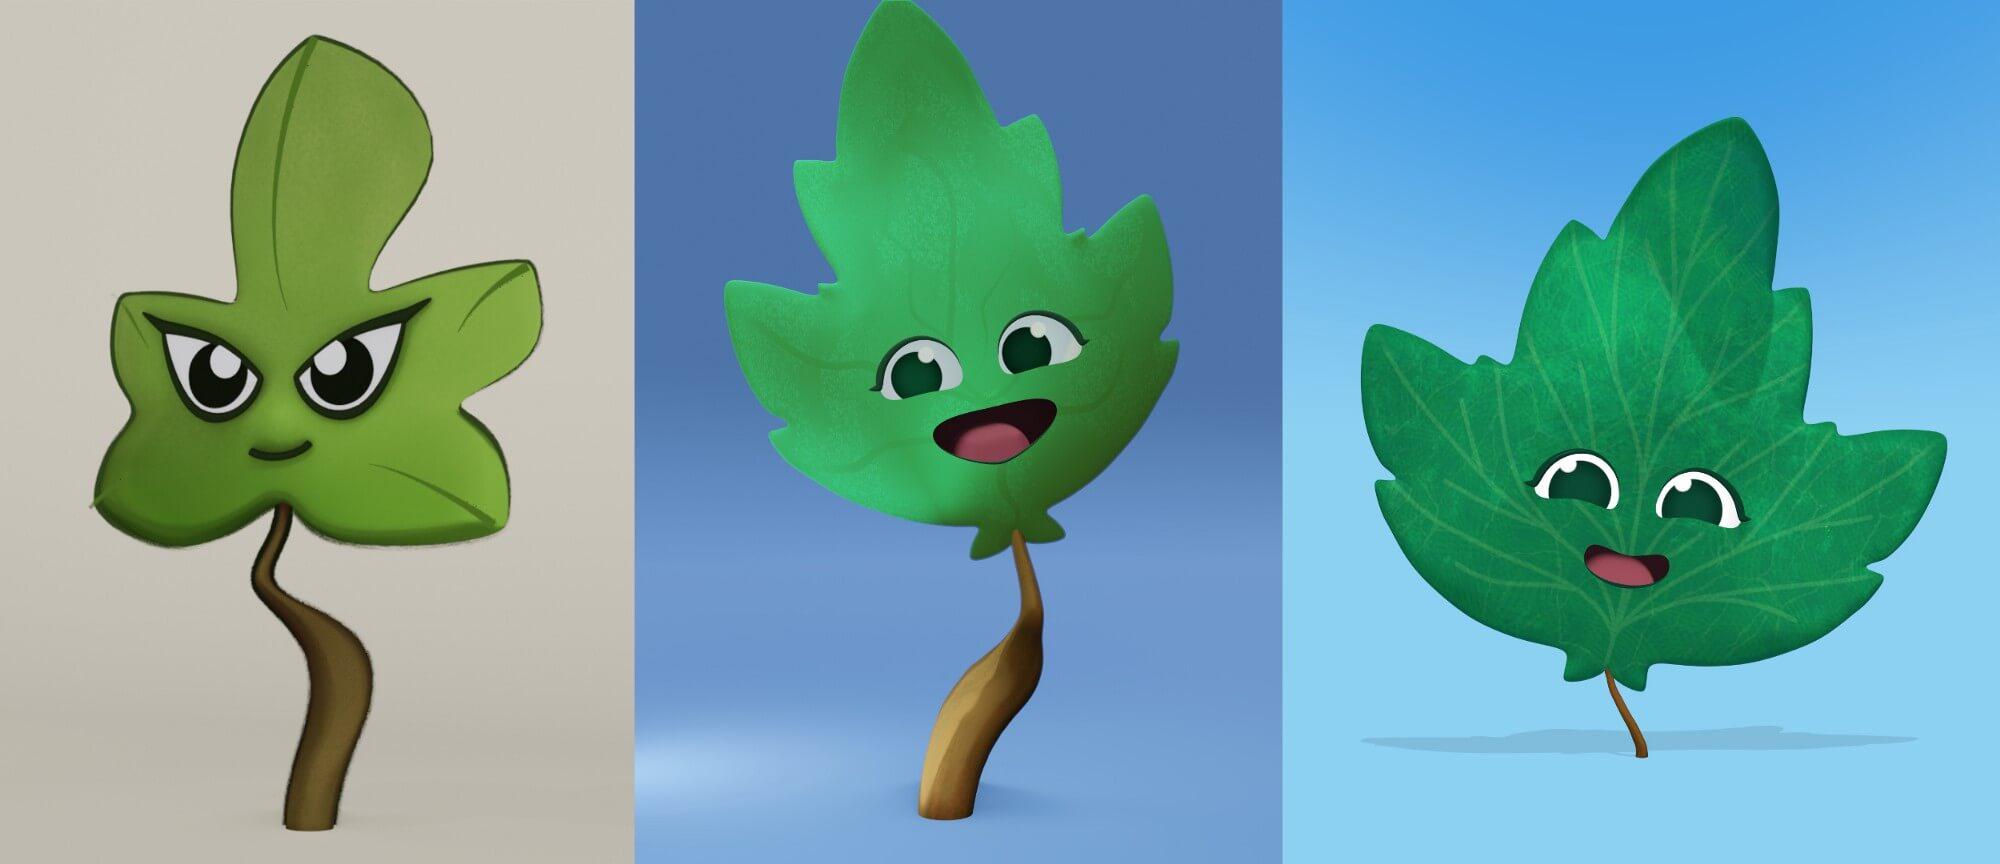 bloo character design